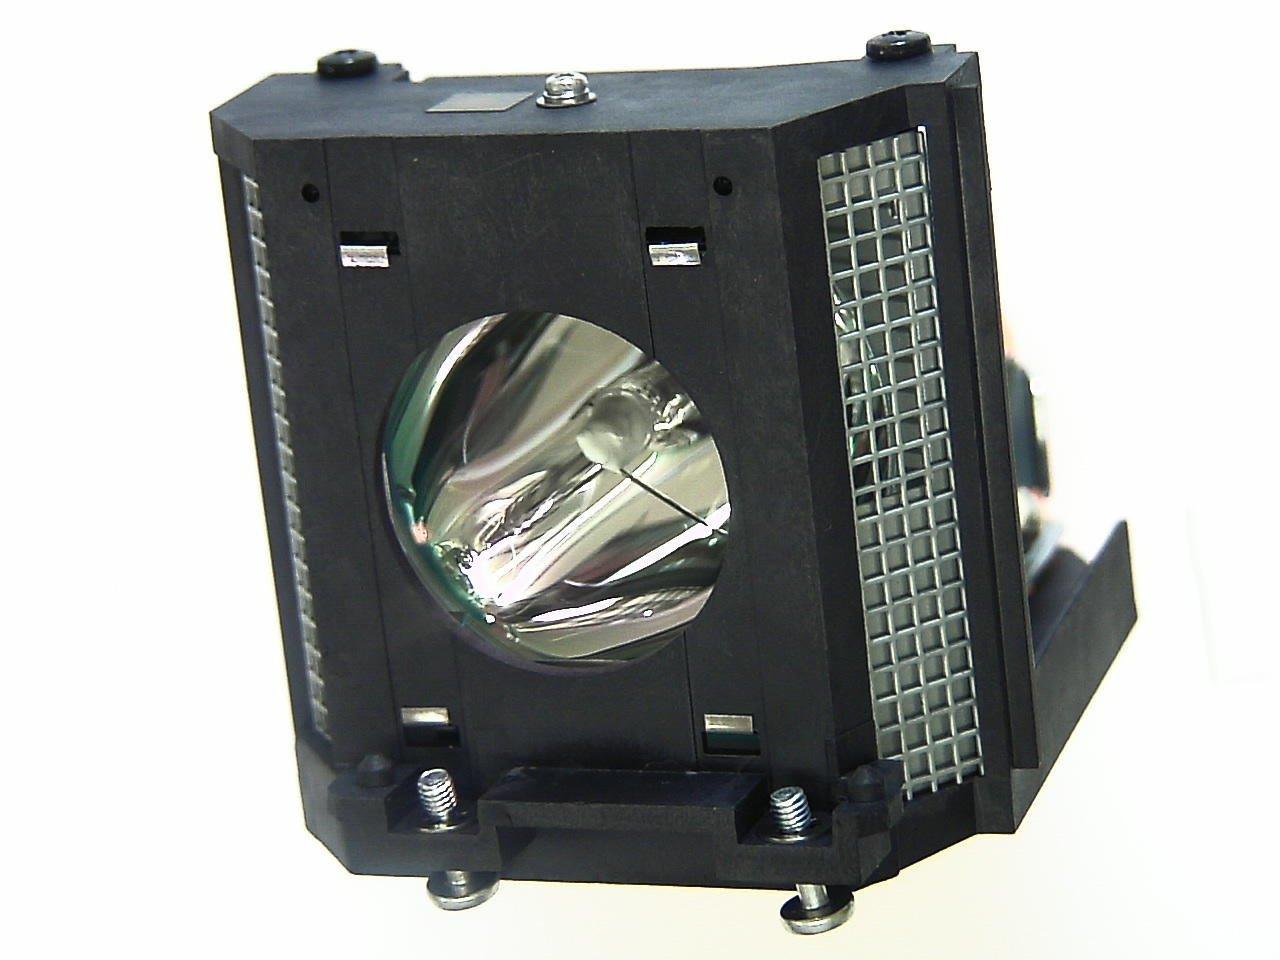 все цены на AN-Z90LP ANZ90LP BQC-XVZ90/1 for SHARP DT-200 XV-Z90 XV-Z90E XV-Z90U XV-Z91 XV-Z91E XV-Z91U Projector Bulb Lamp with housing онлайн